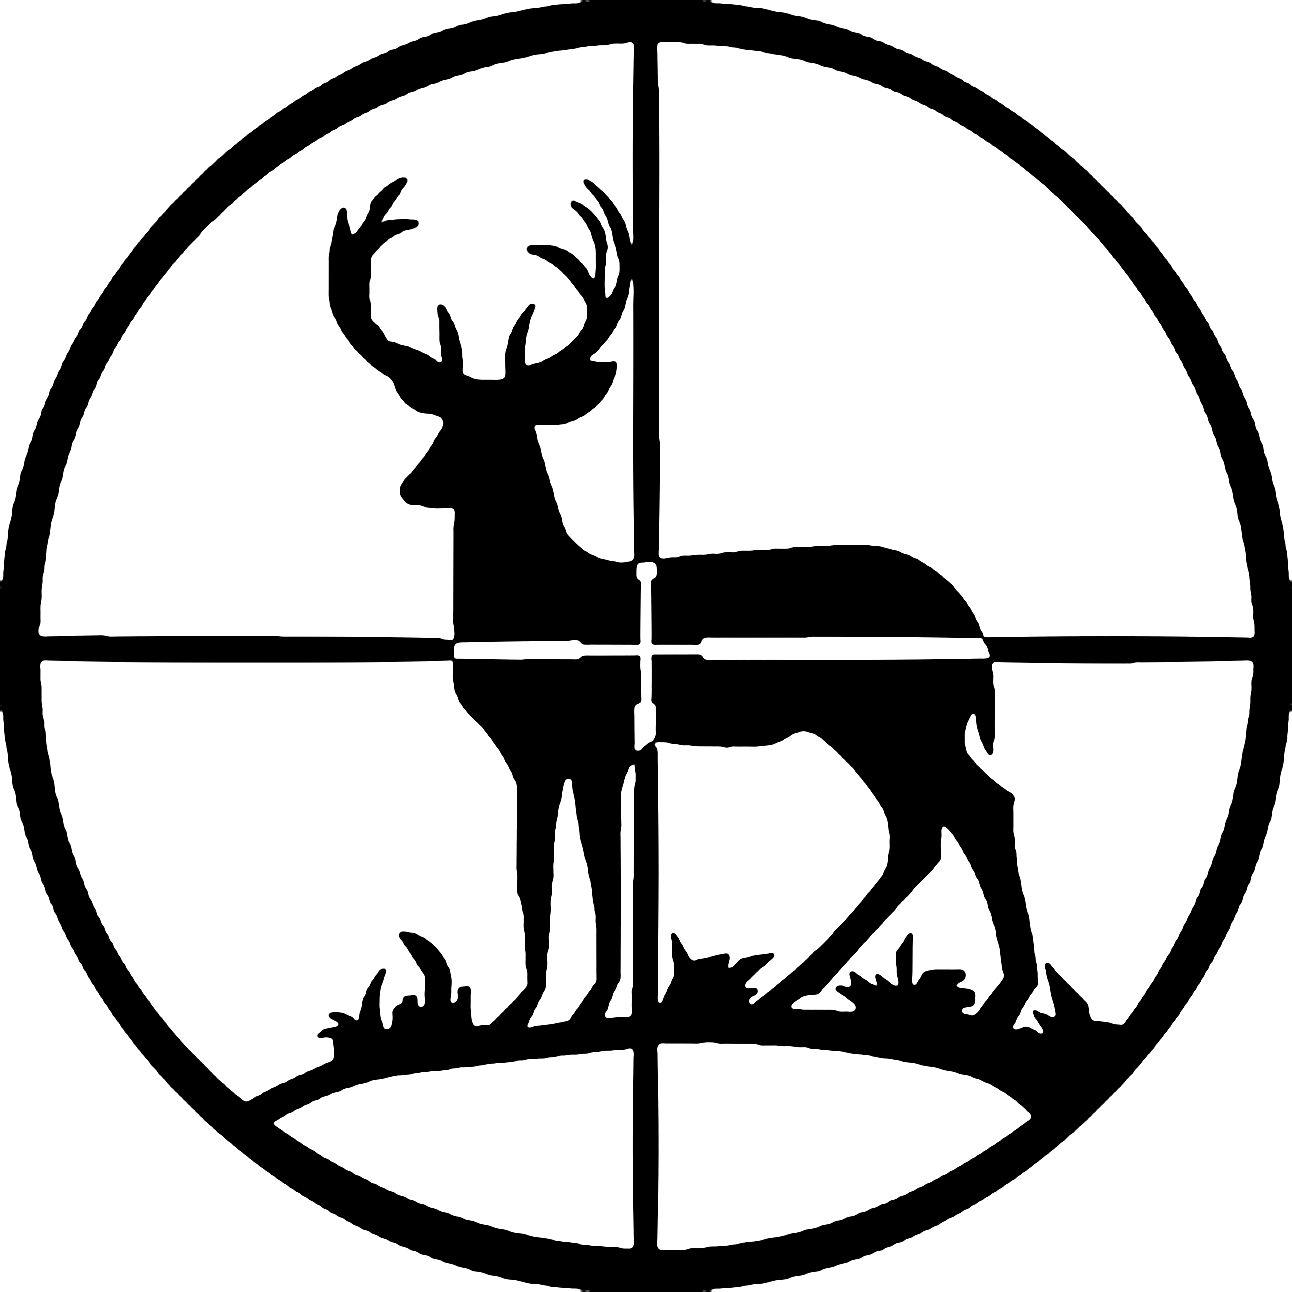 jpg free stock Hunting clipart. Deer silhouette decal art.